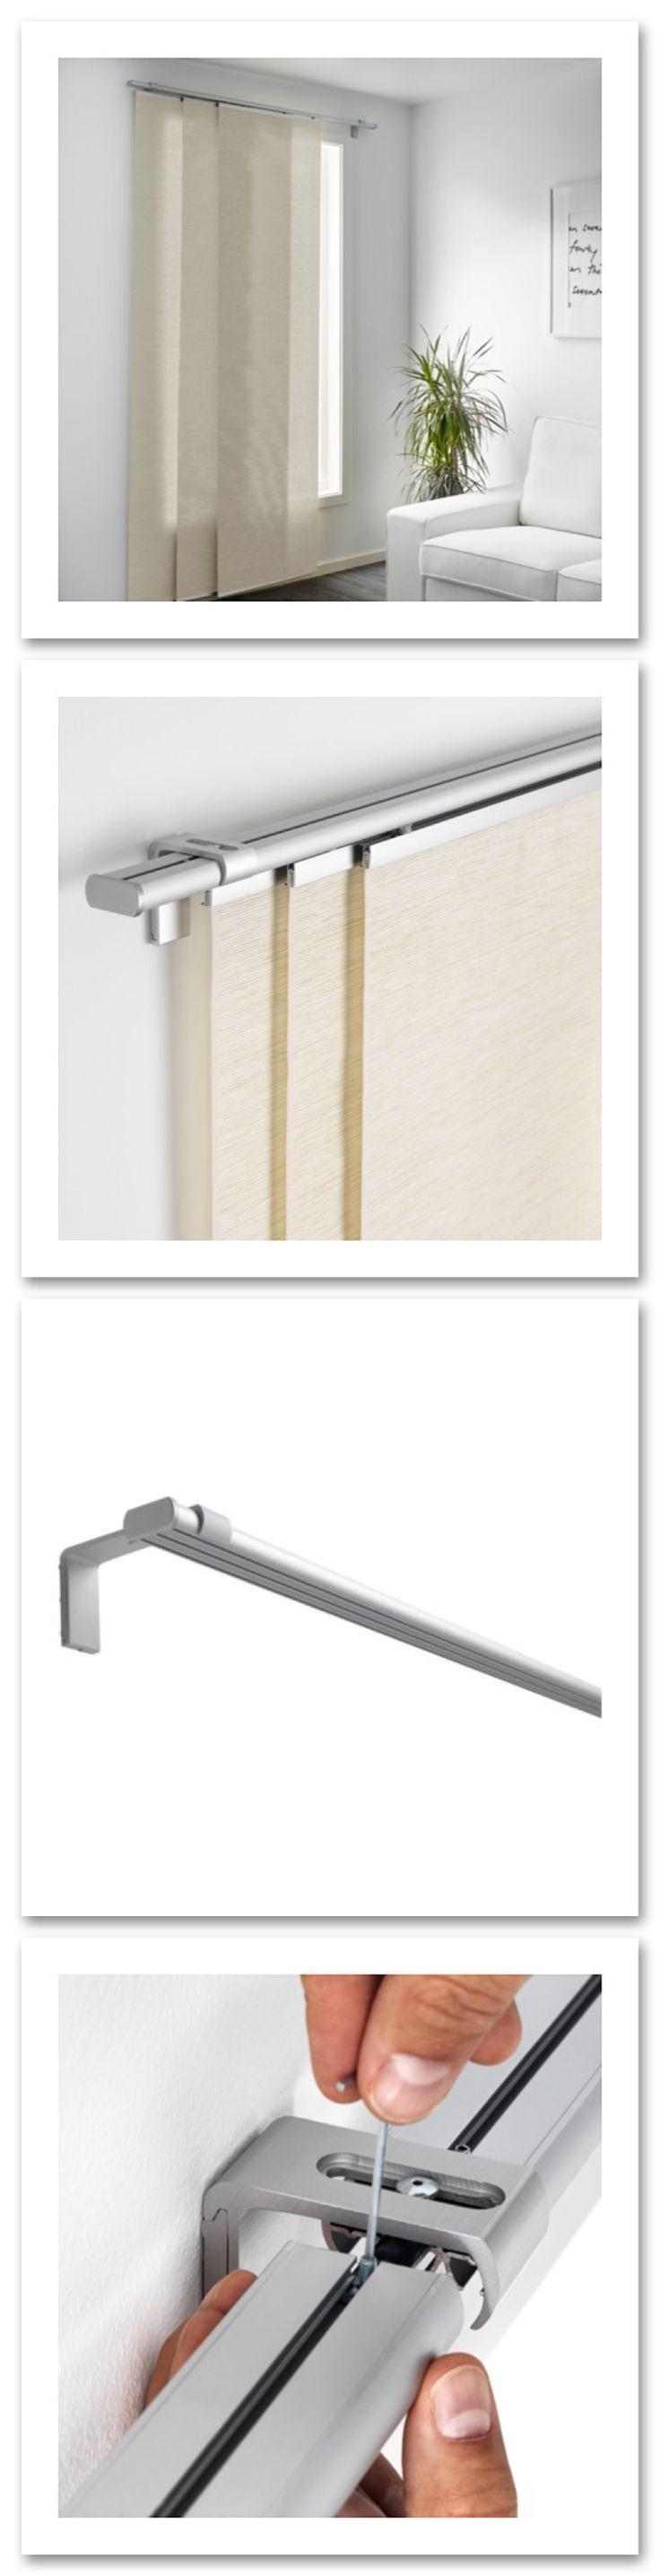 Floor to ceiling curtains on ikea kvartal curtain rail system build a - Kvartal Triple Curtain Rail 55 Each 20 Attach Multiple Rails With L Bracket Hardware